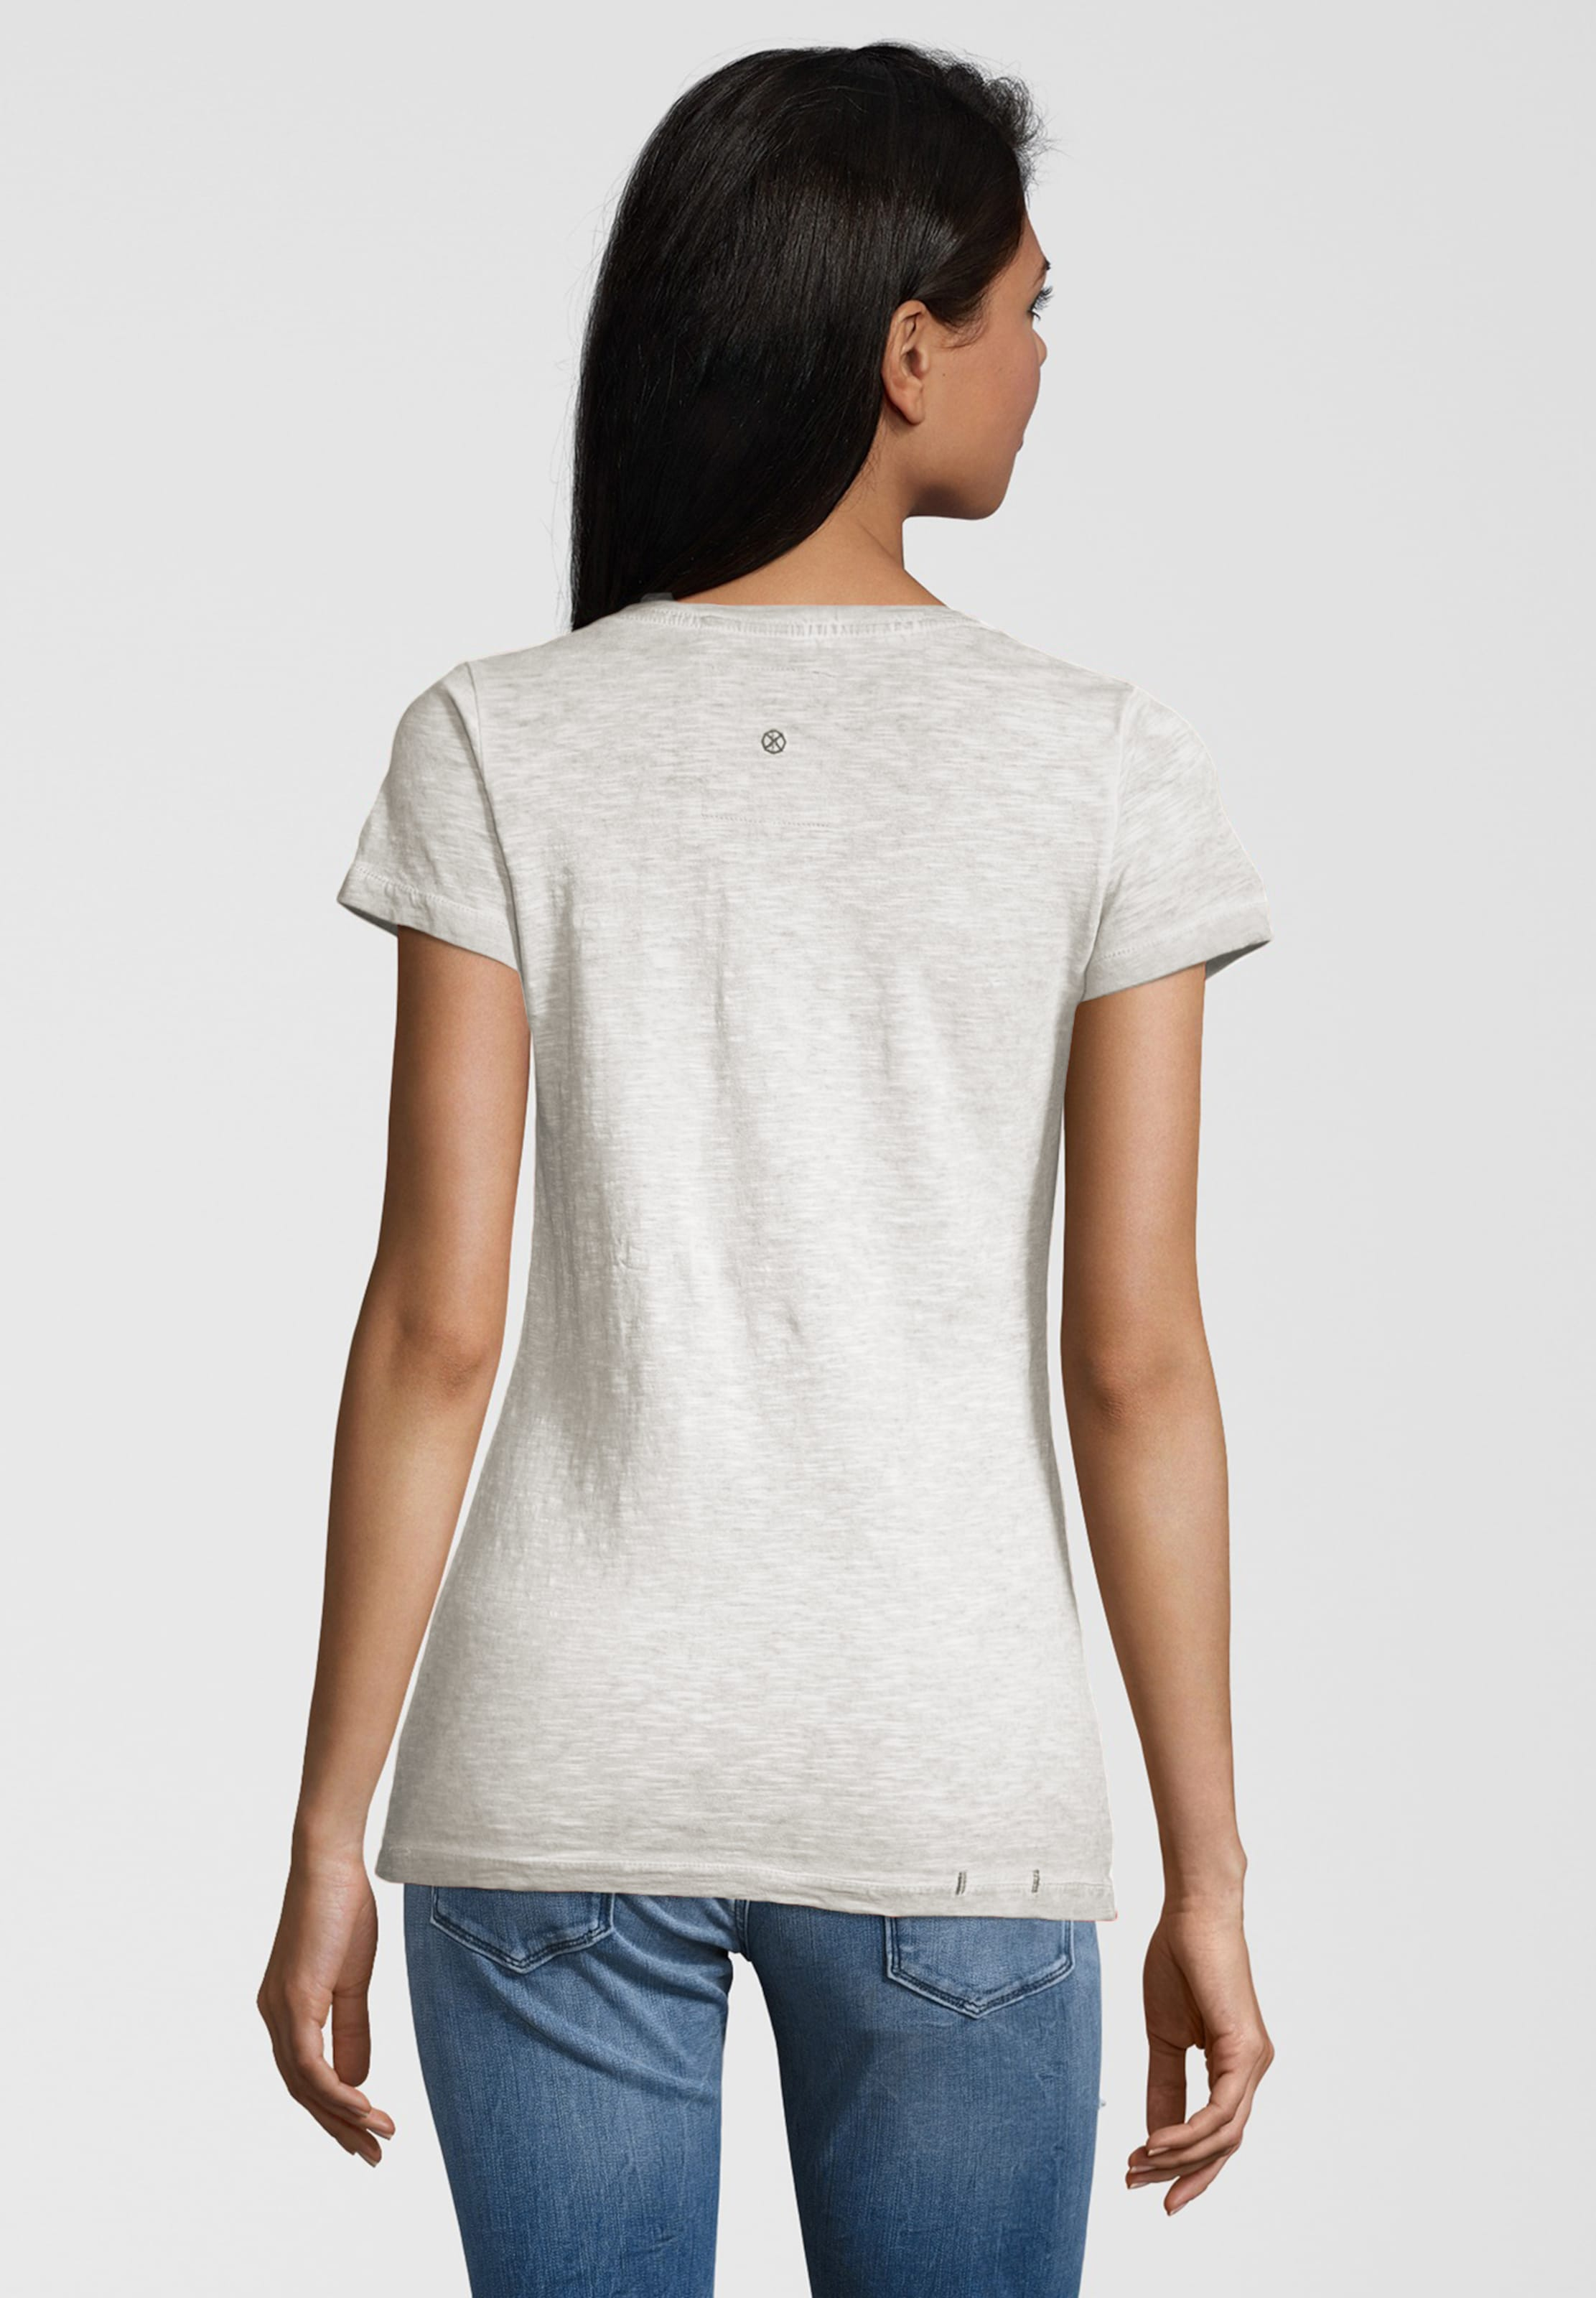 For shirt In Shirts T 'mara' Life DunkelgrauWeiß Ygyf7b6v